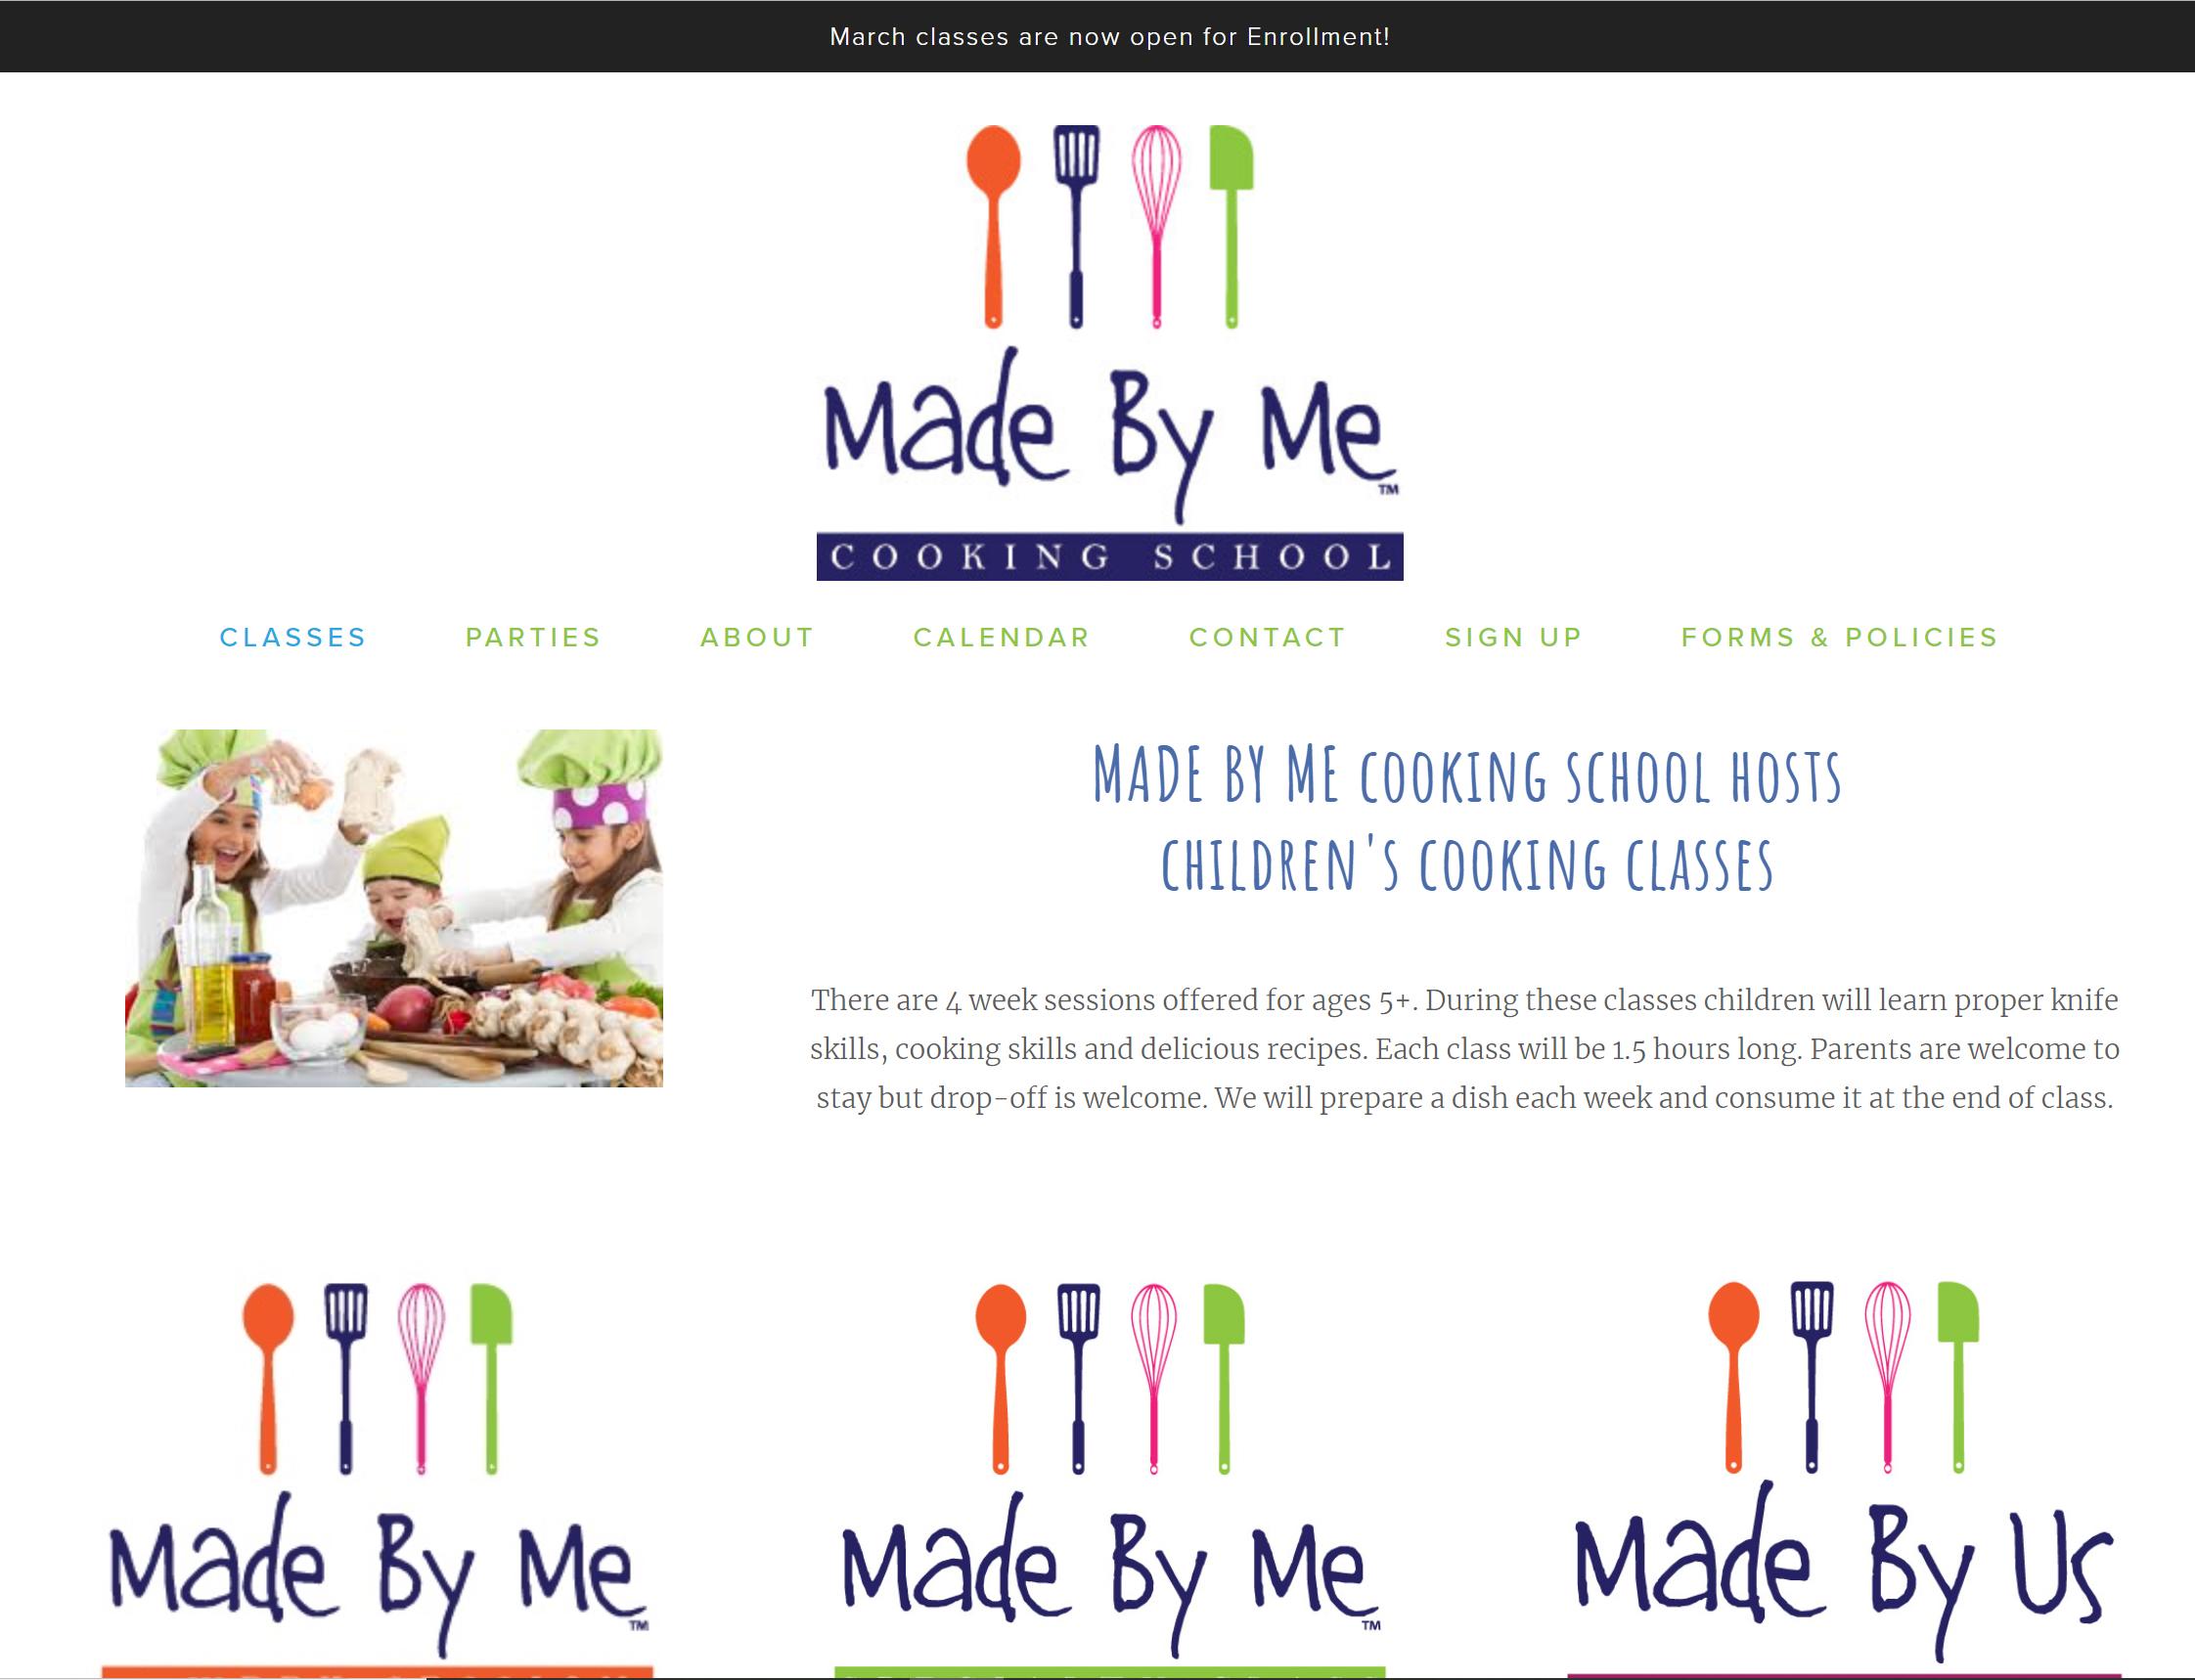 www.MadeByMeCookingSchool.com